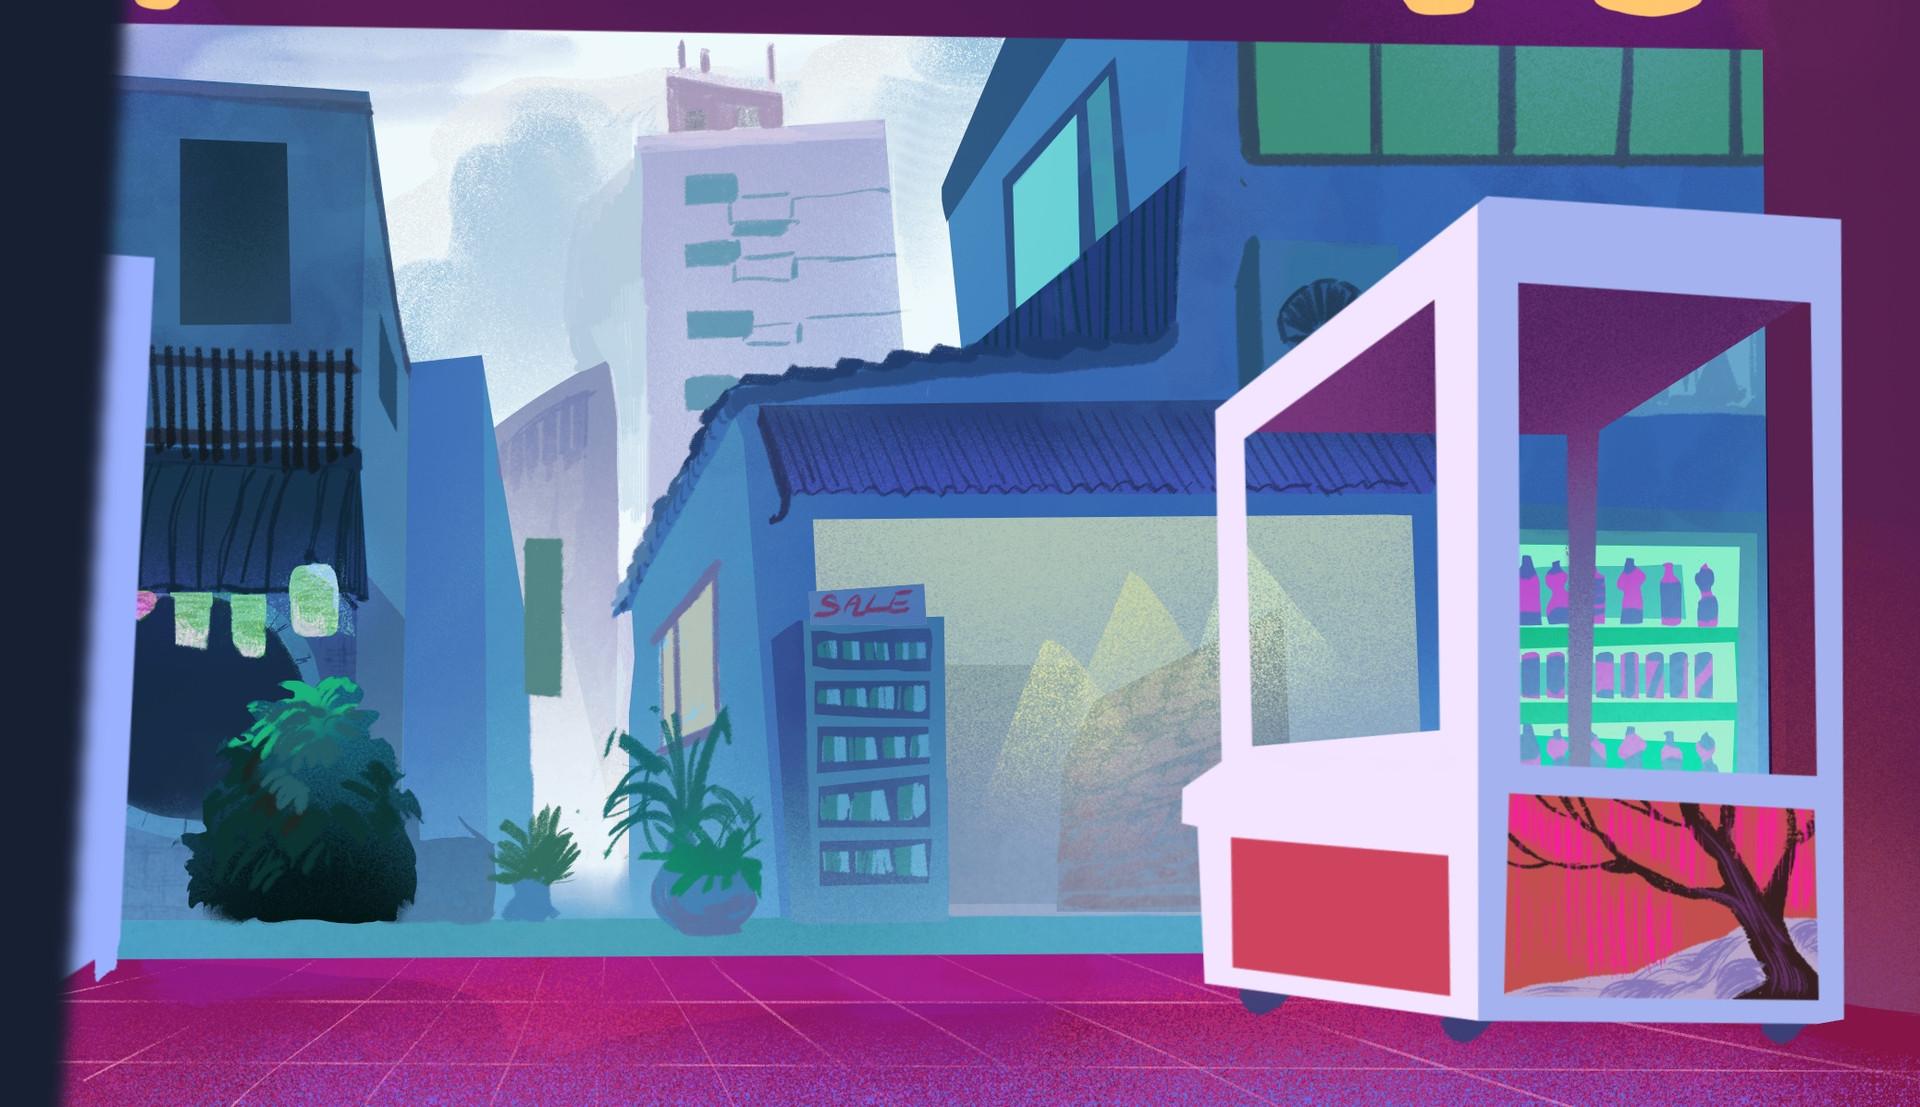 Japanese Game Center Background